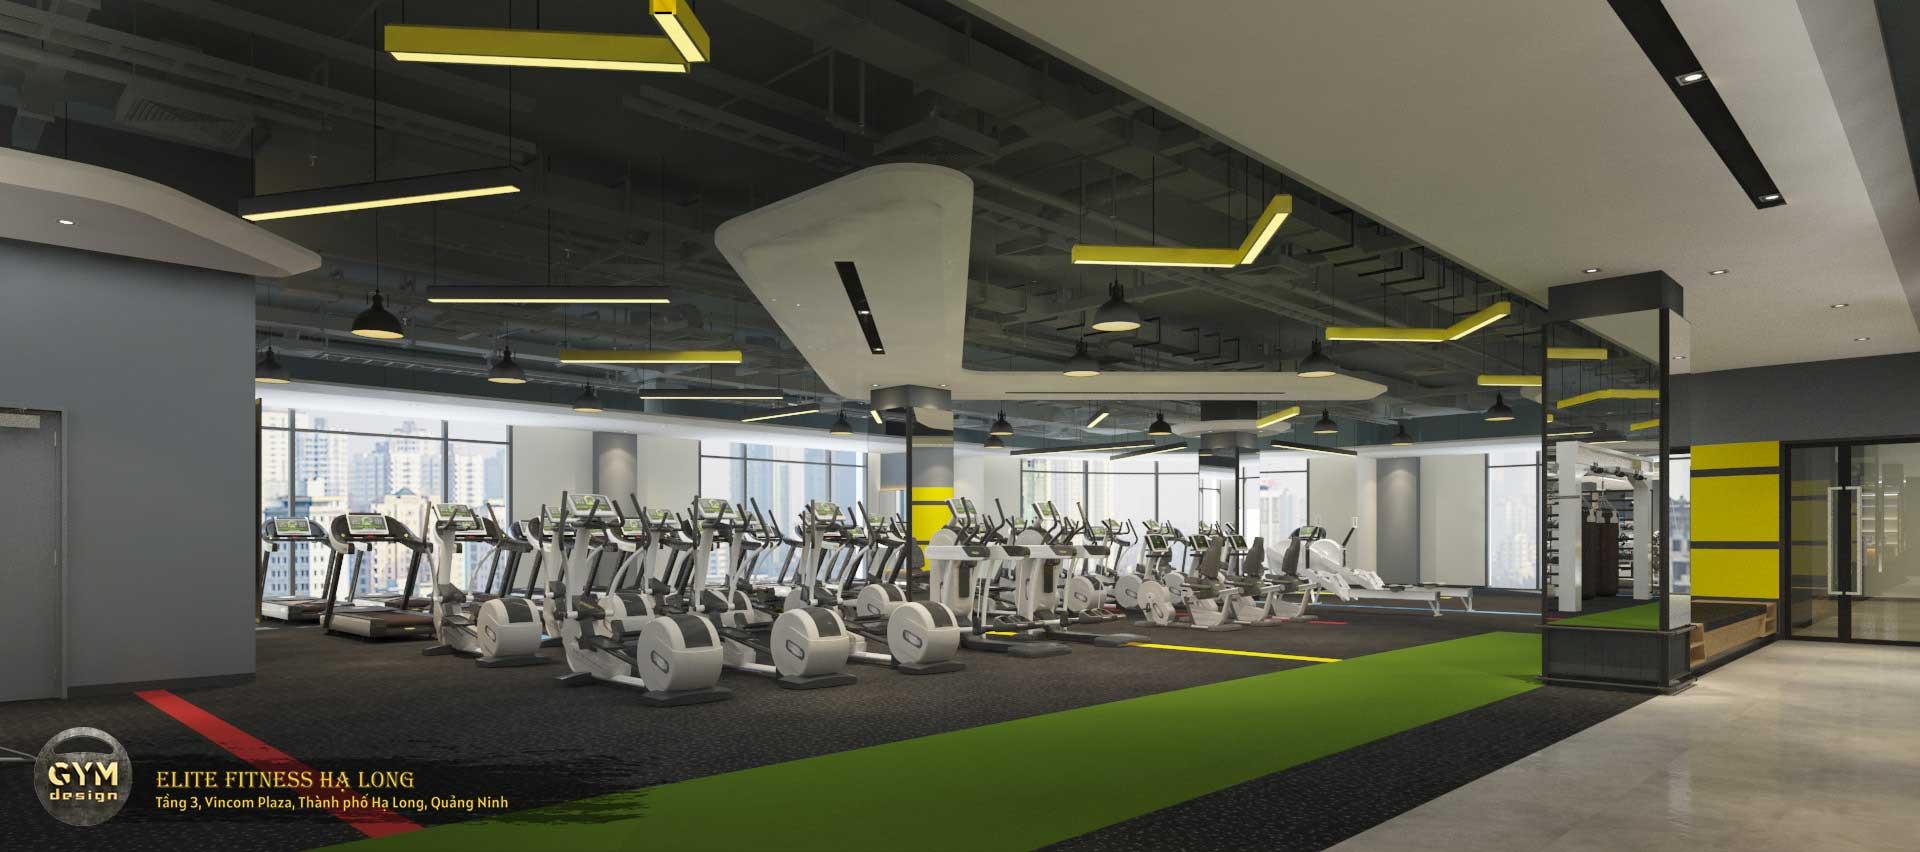 thiet-ke-phong-gym-elite-fitness-ha-long-38